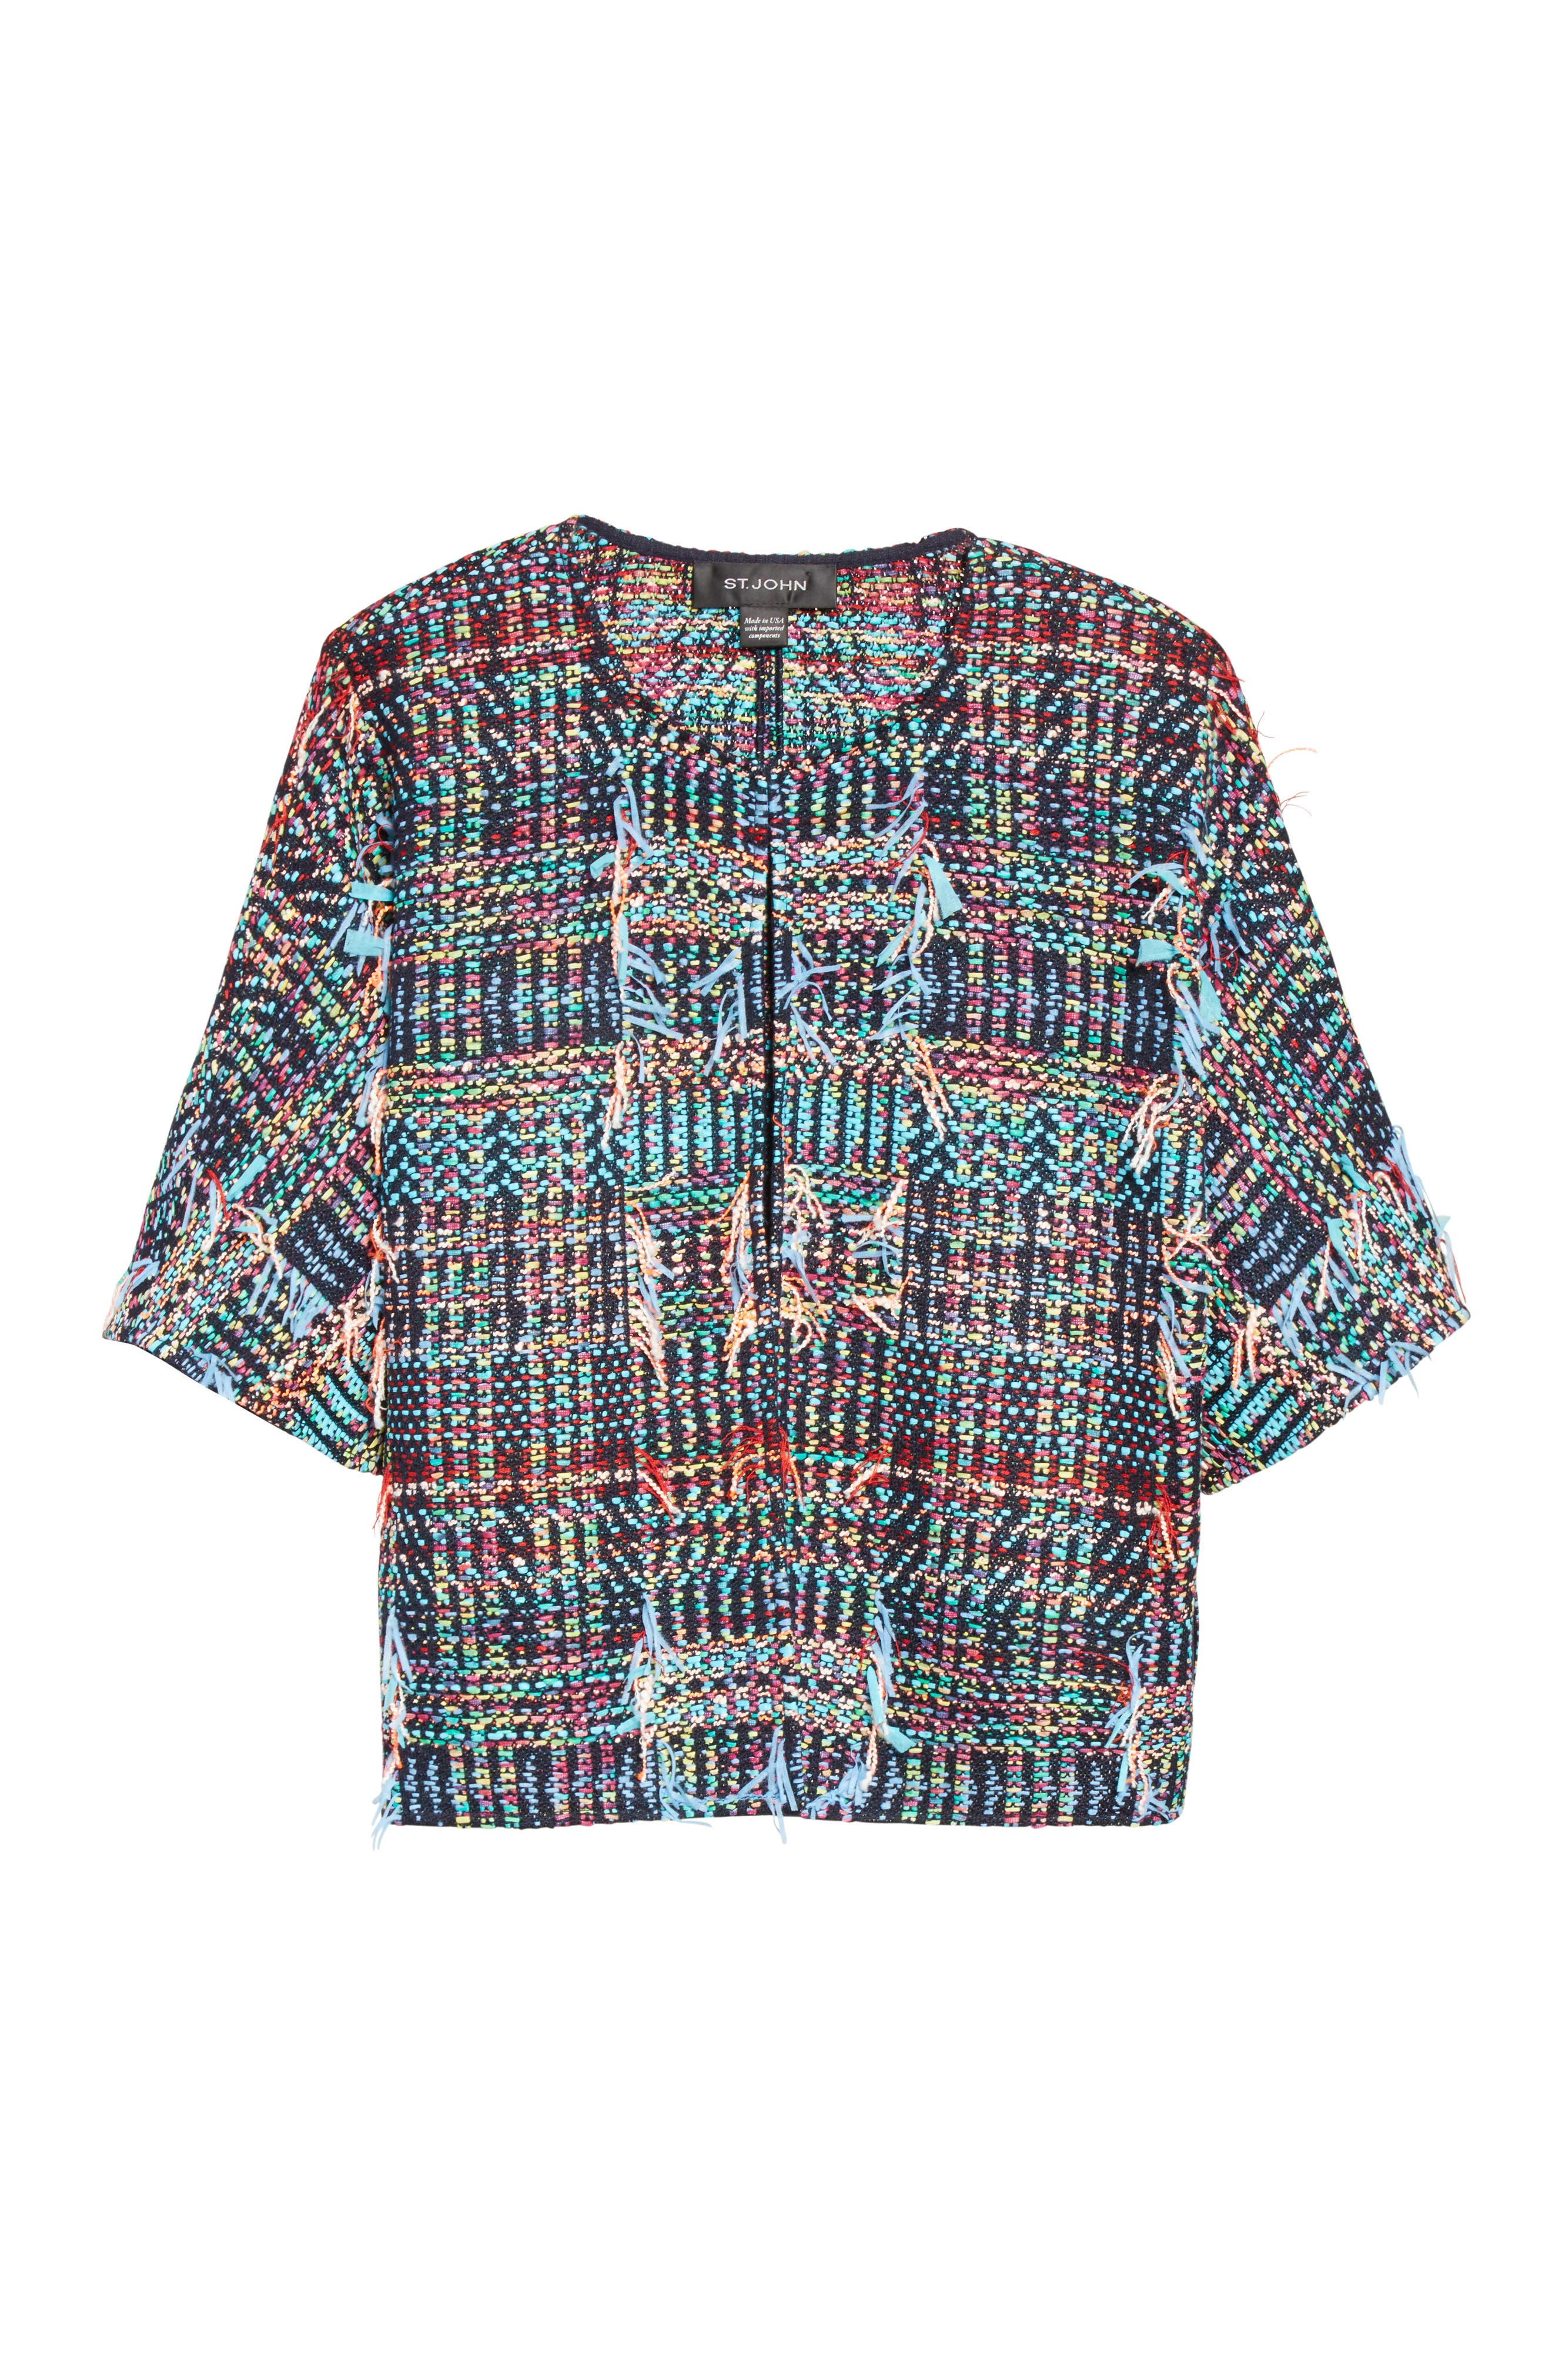 Dara Fringe Knit Jacket,                             Alternate thumbnail 2, color,